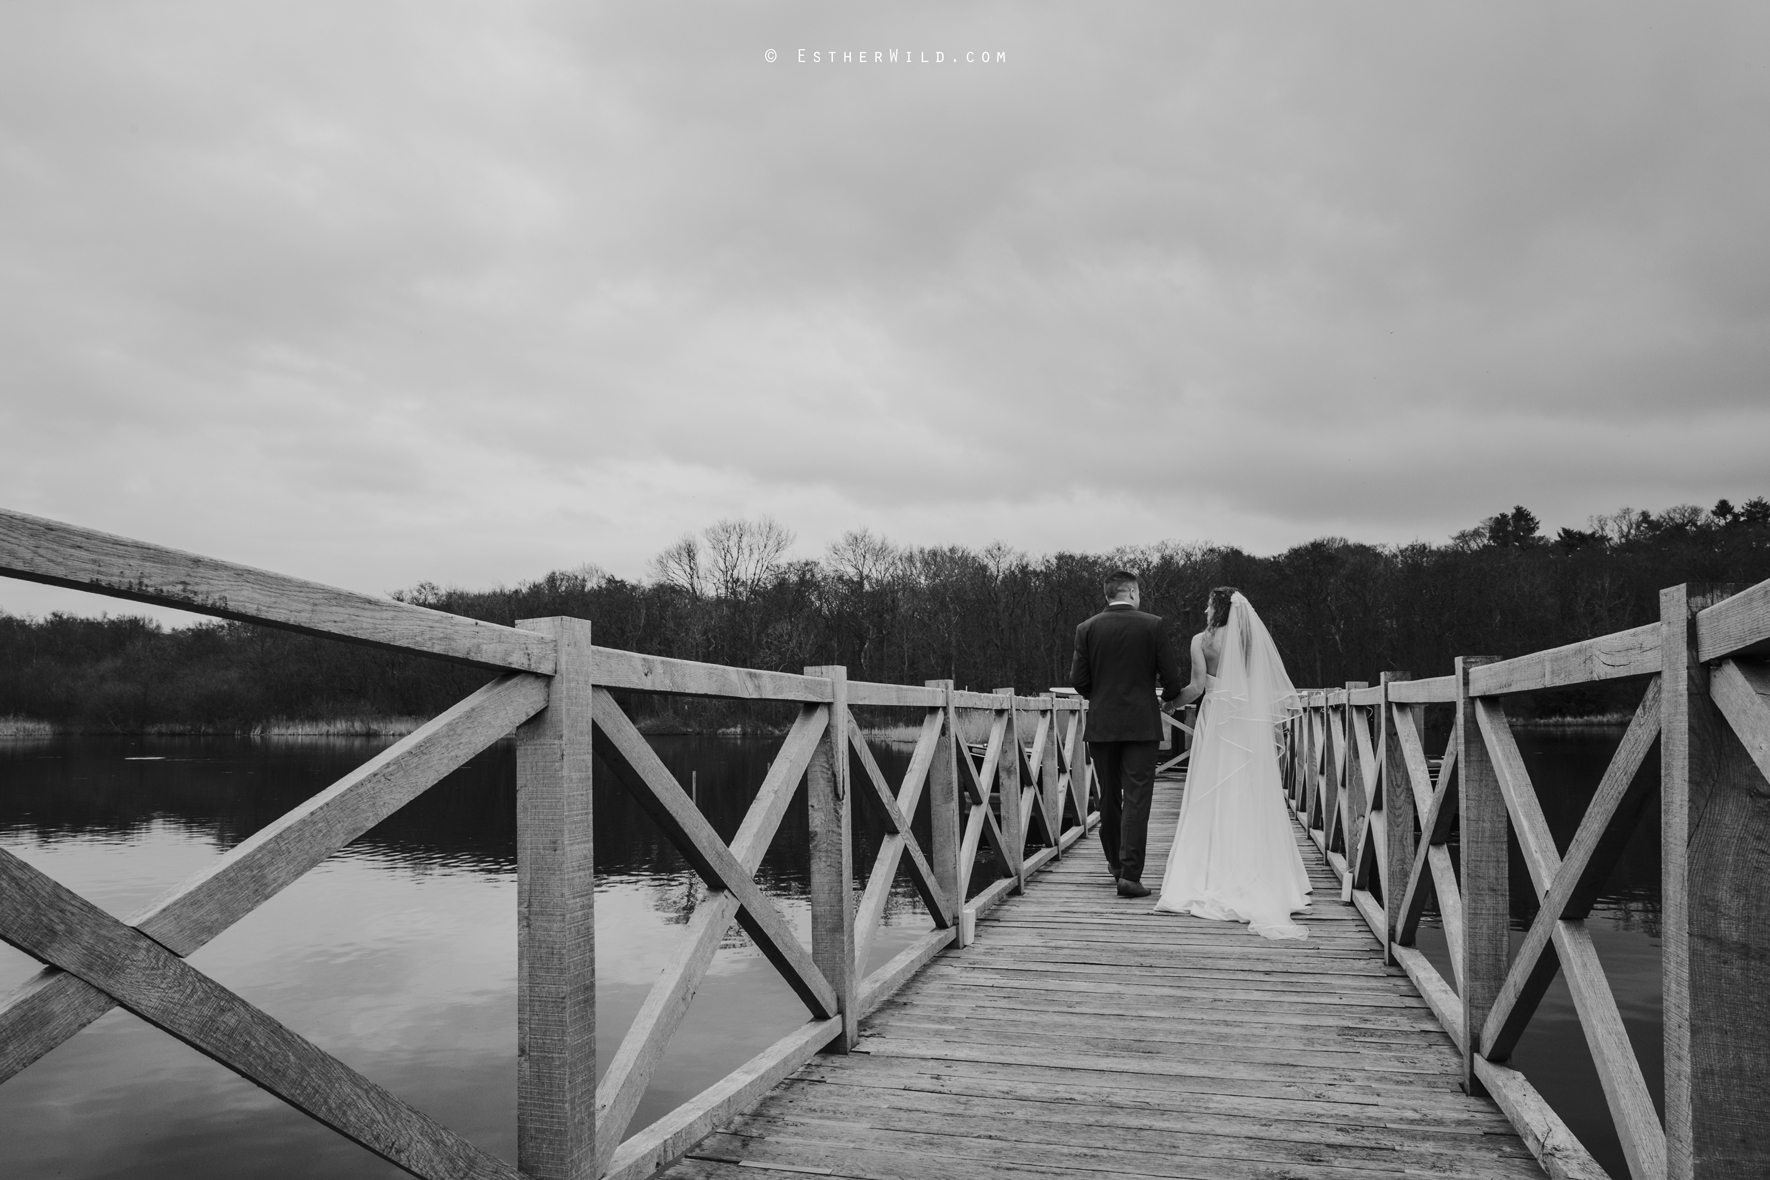 The_BoatHouse_Wedding_Venue_Ormesby_Norfolk_Broads_Boat_Wedding_Photography_Esther_Wild_Photographer_IMG_1434-2.jpg